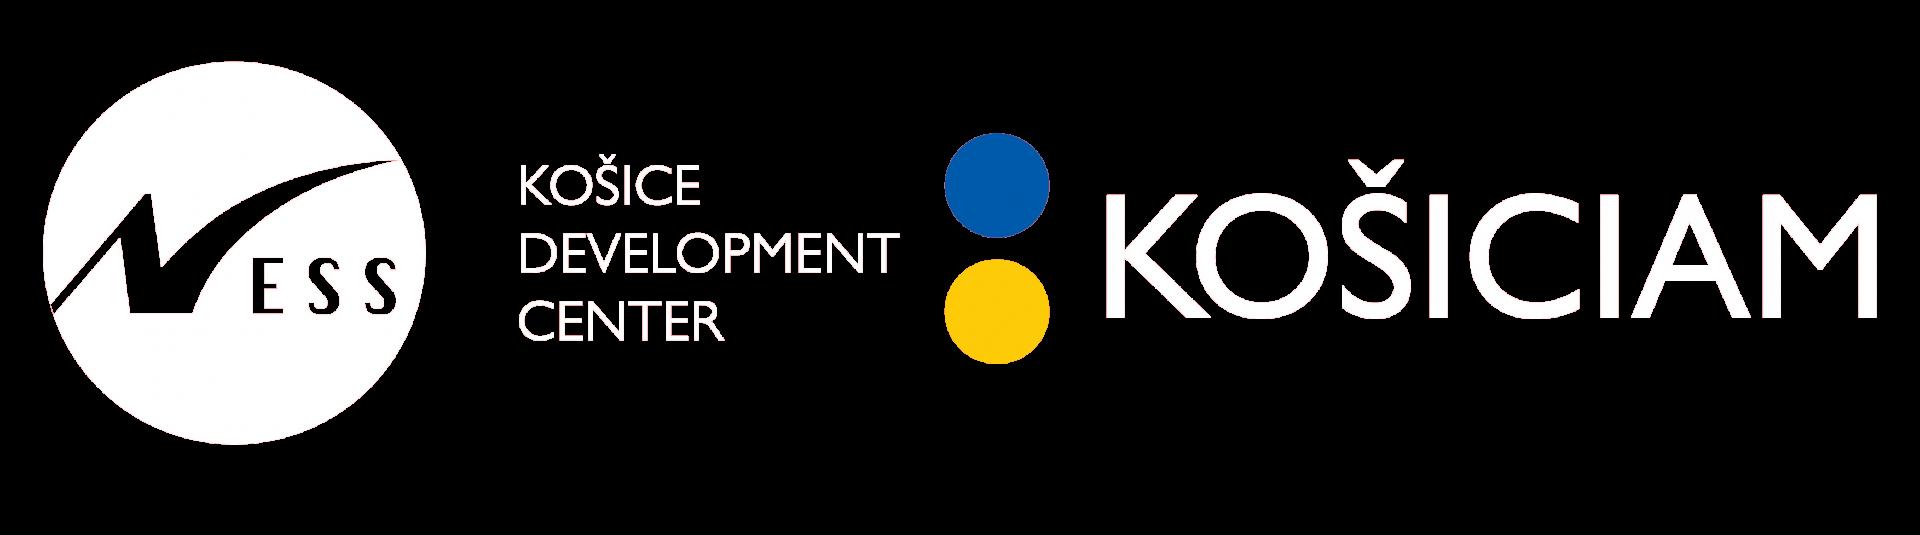 ness kdc logo